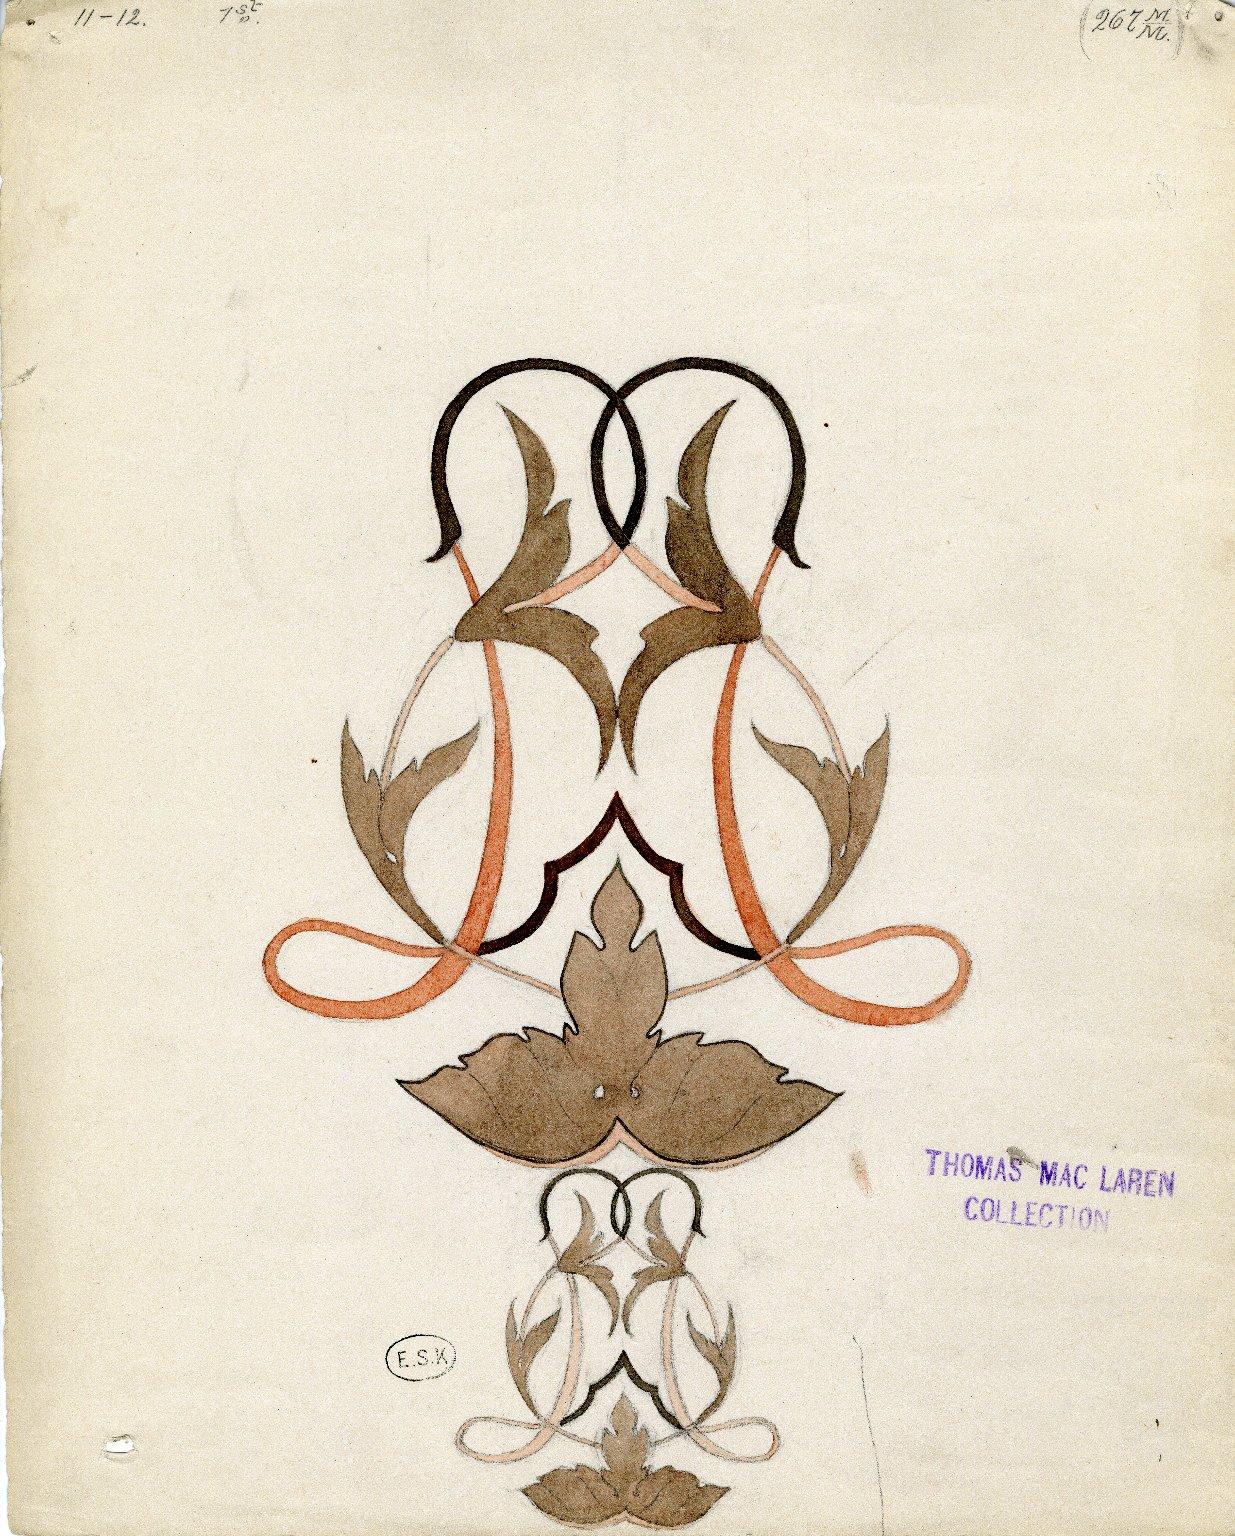 Floral watercolor design in brown, orange, black tones